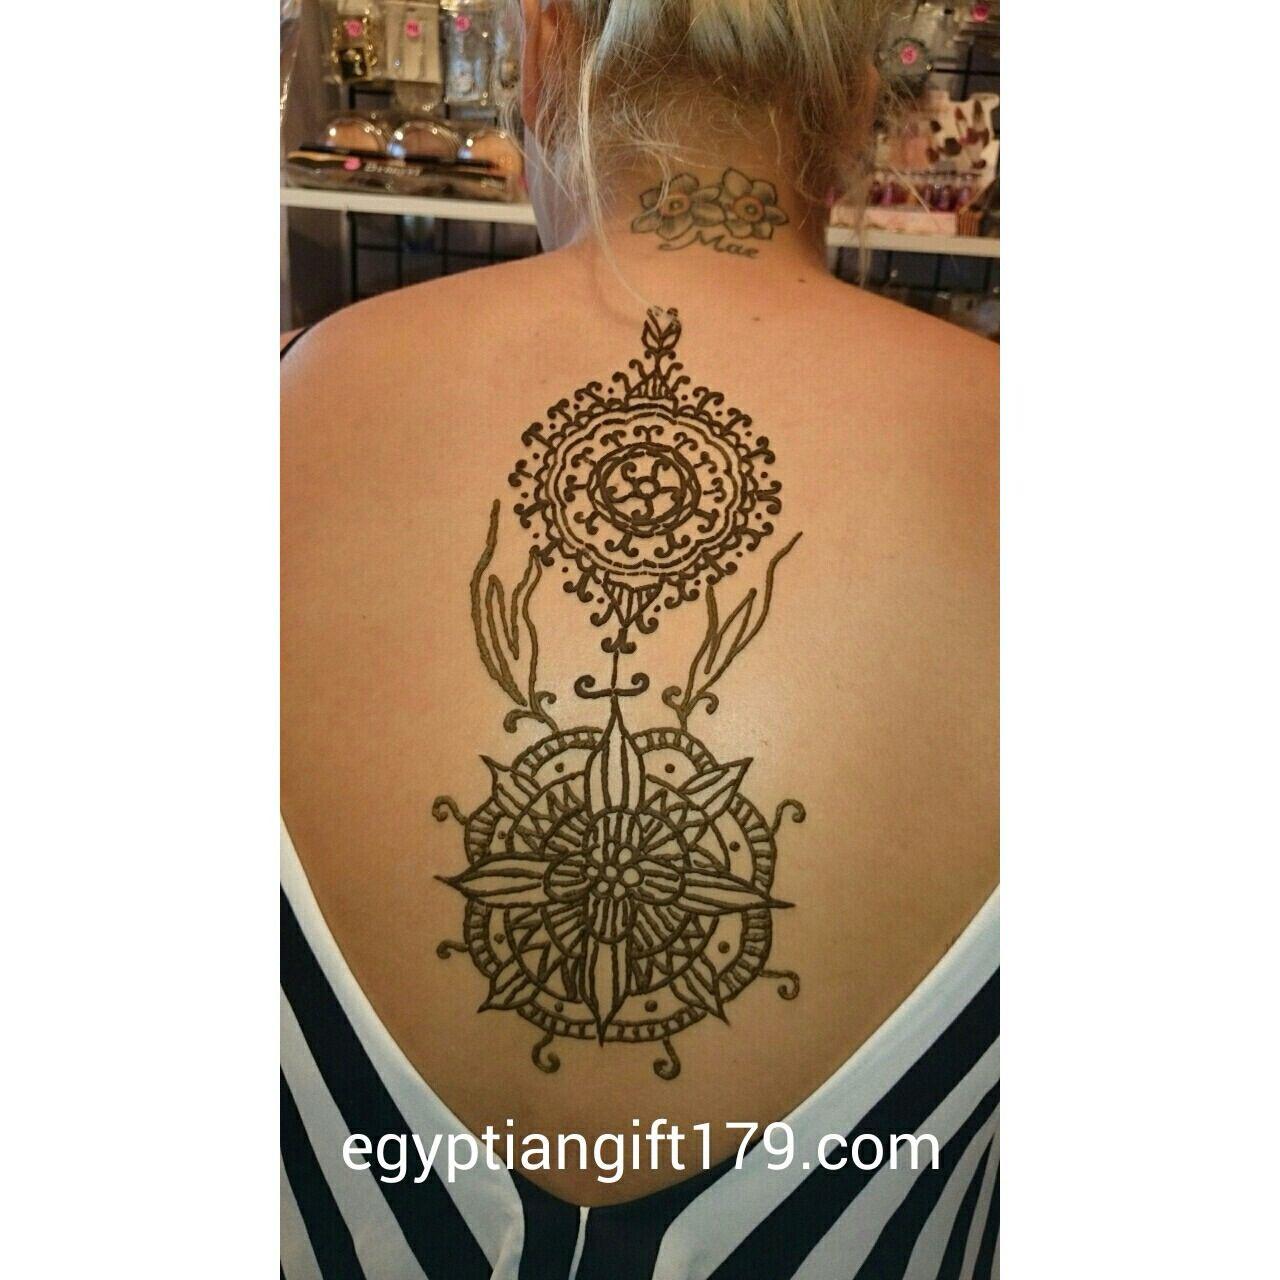 Egyptian gift corner henna shop tattoo near me tattoos